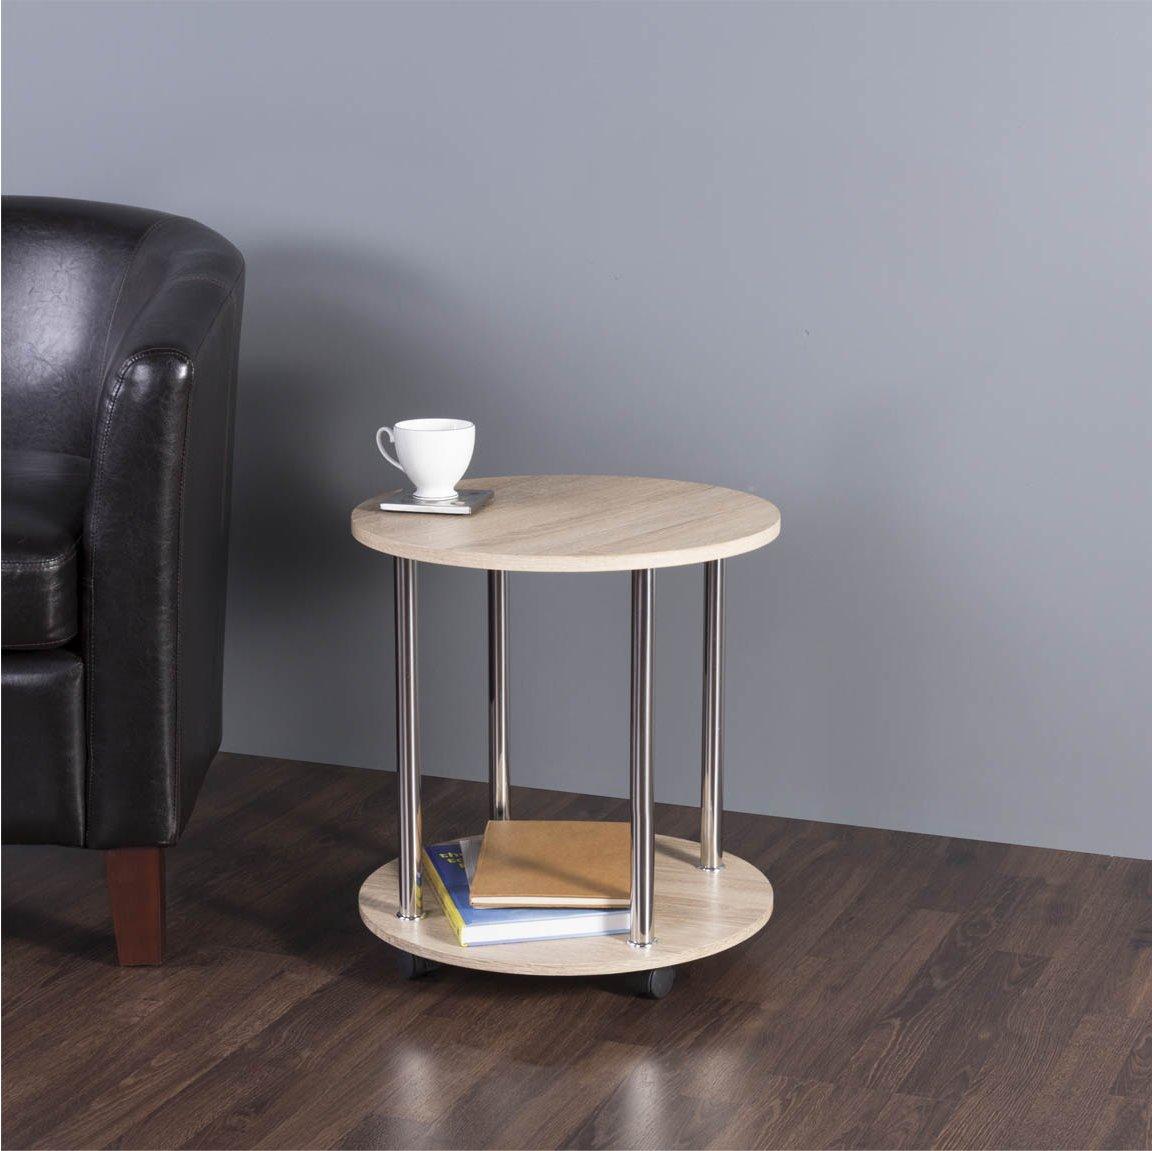 Avf t62wo lamp tables for Avf furniture